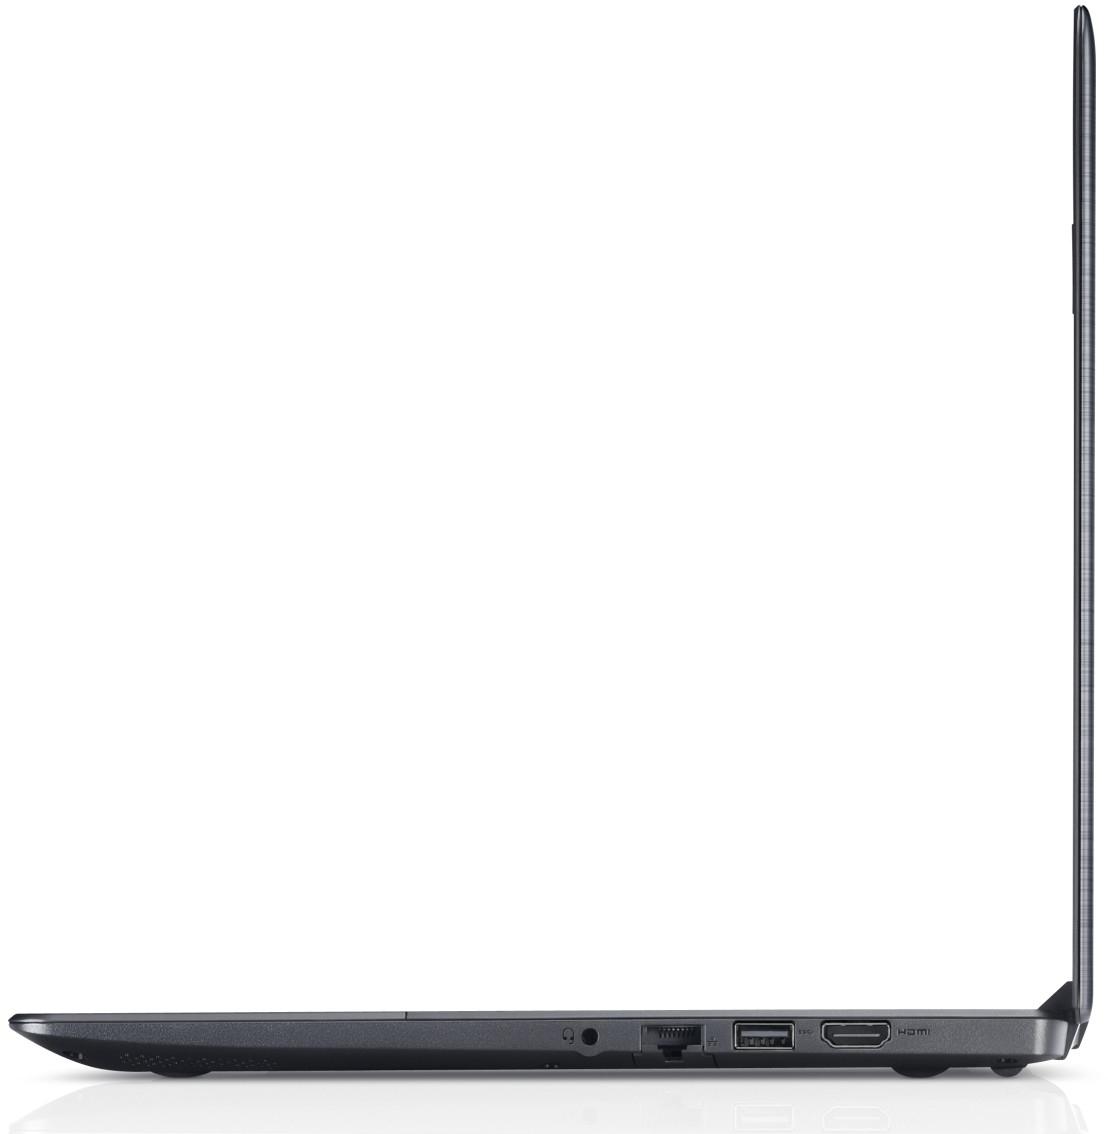 dell thin laptop